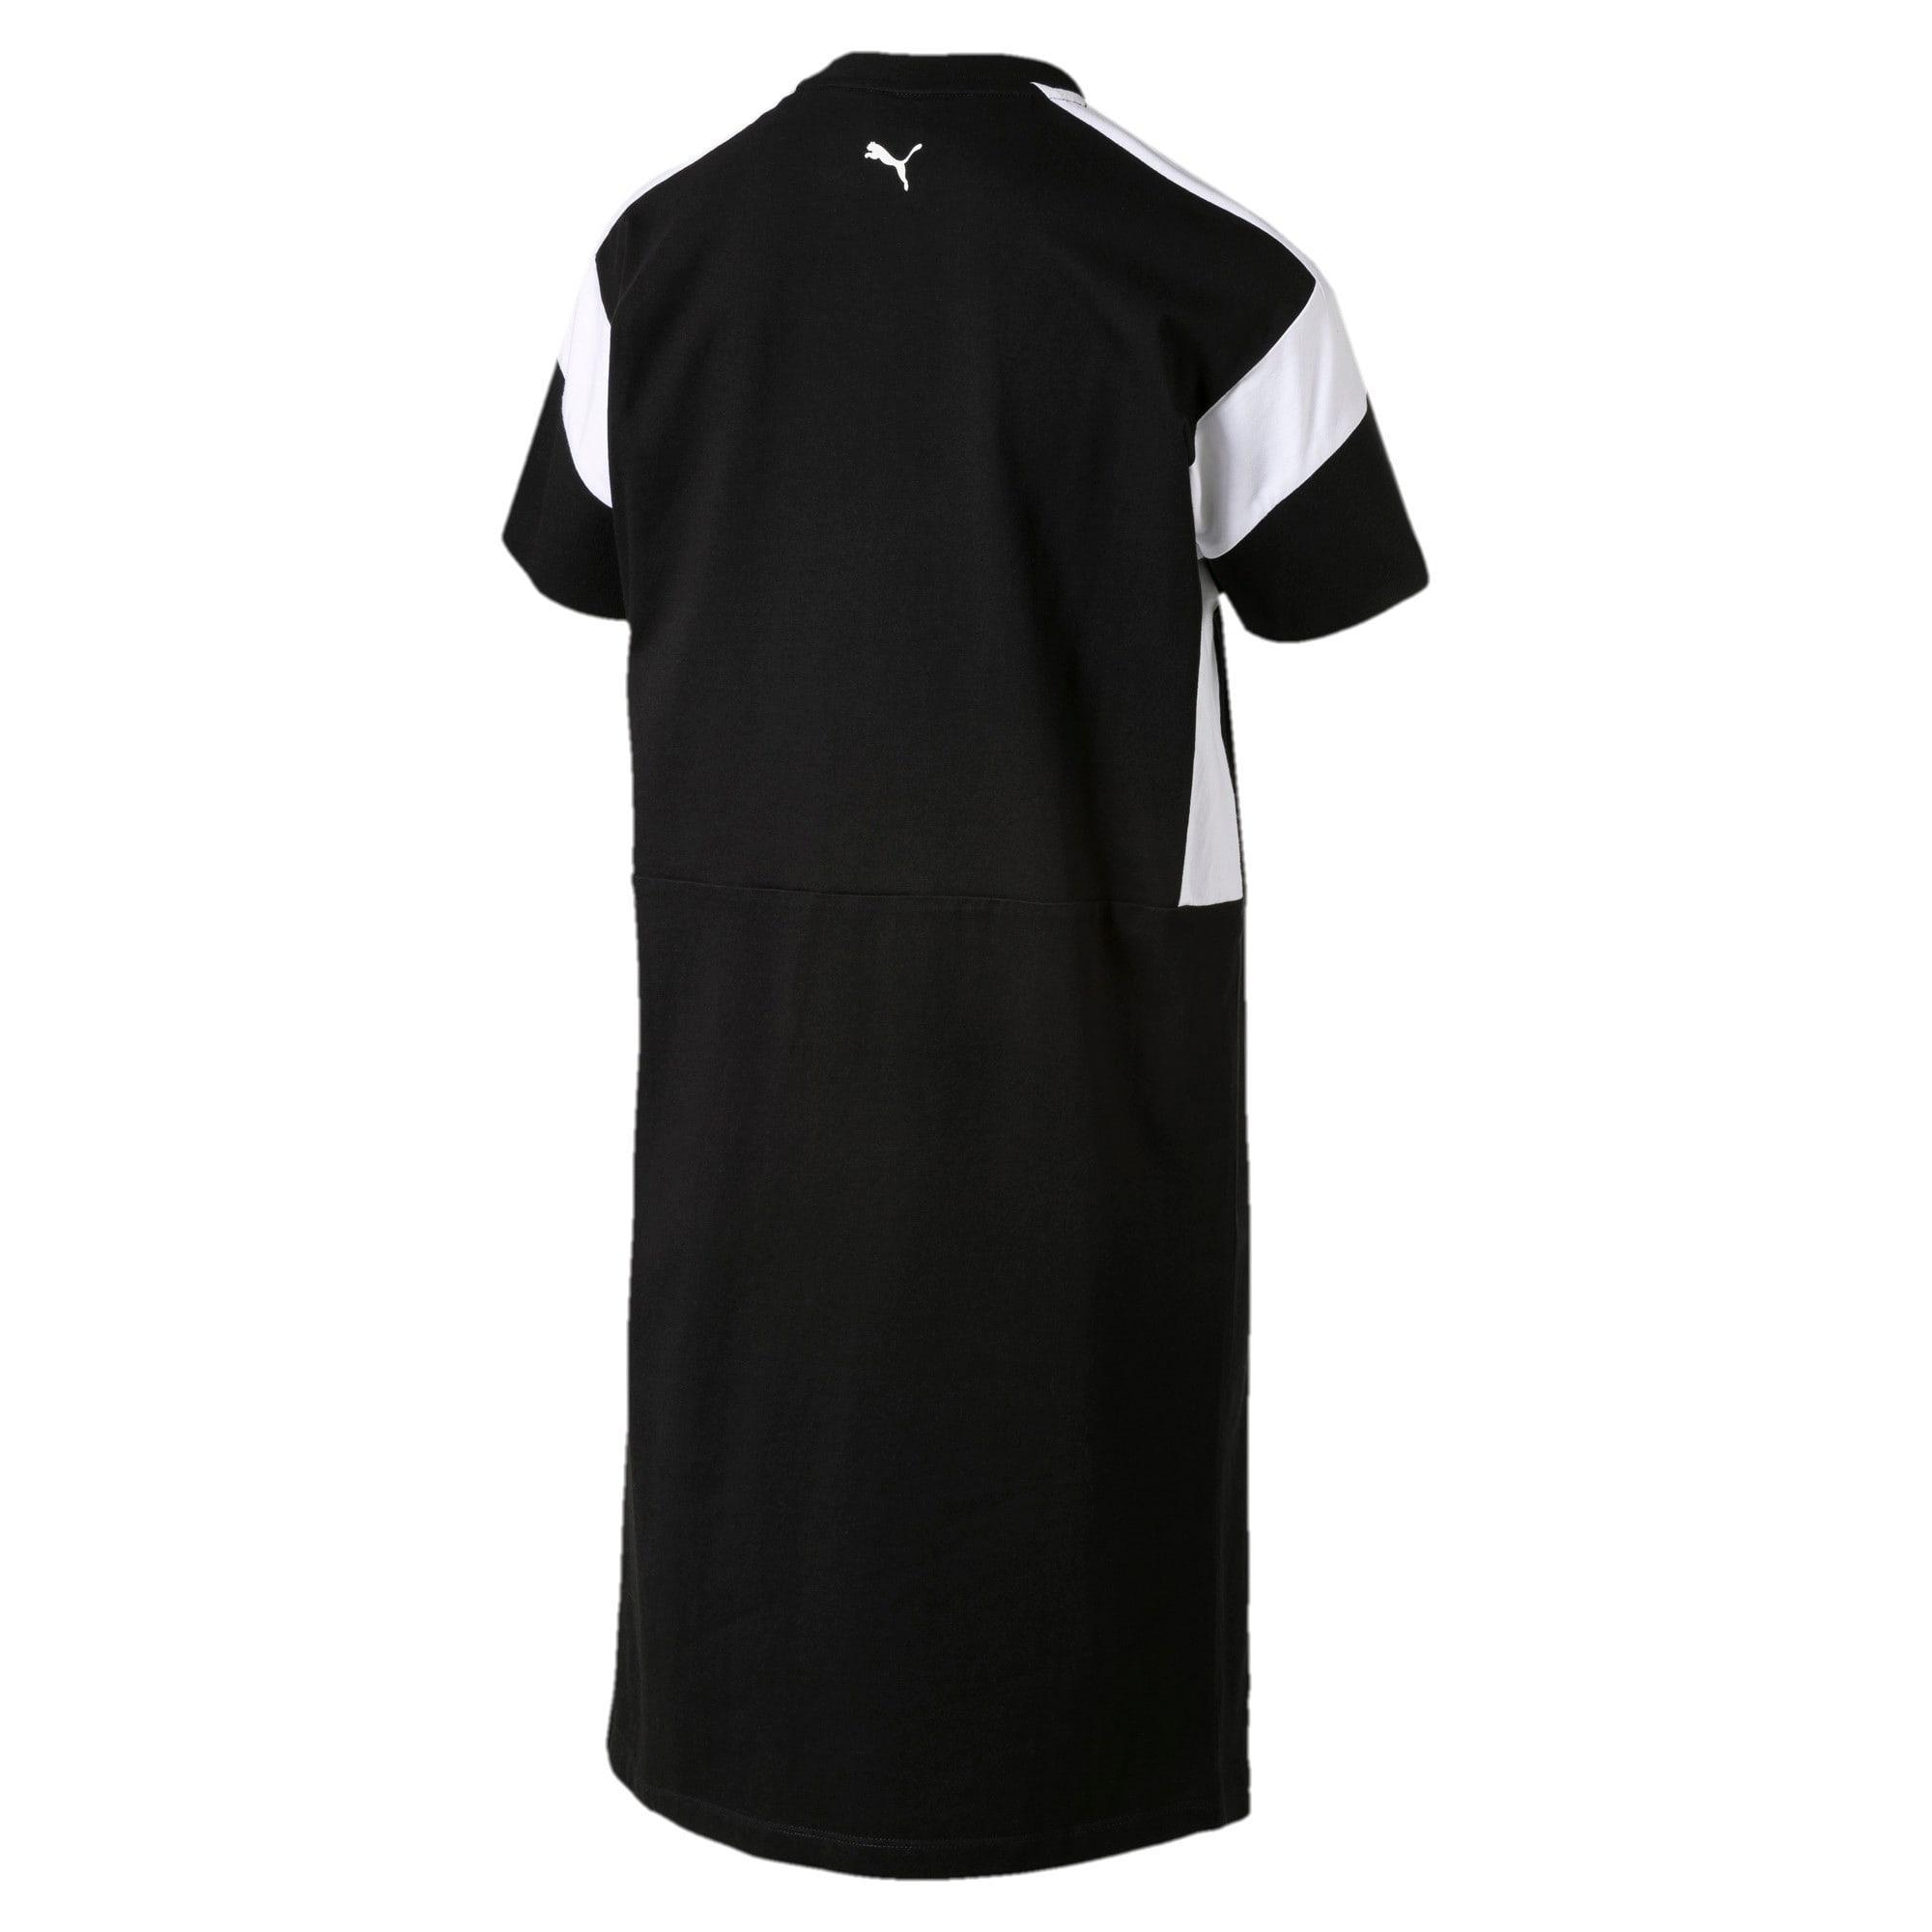 Thumbnail 3 of Chase Women's Dress, Cotton Black, medium-IND